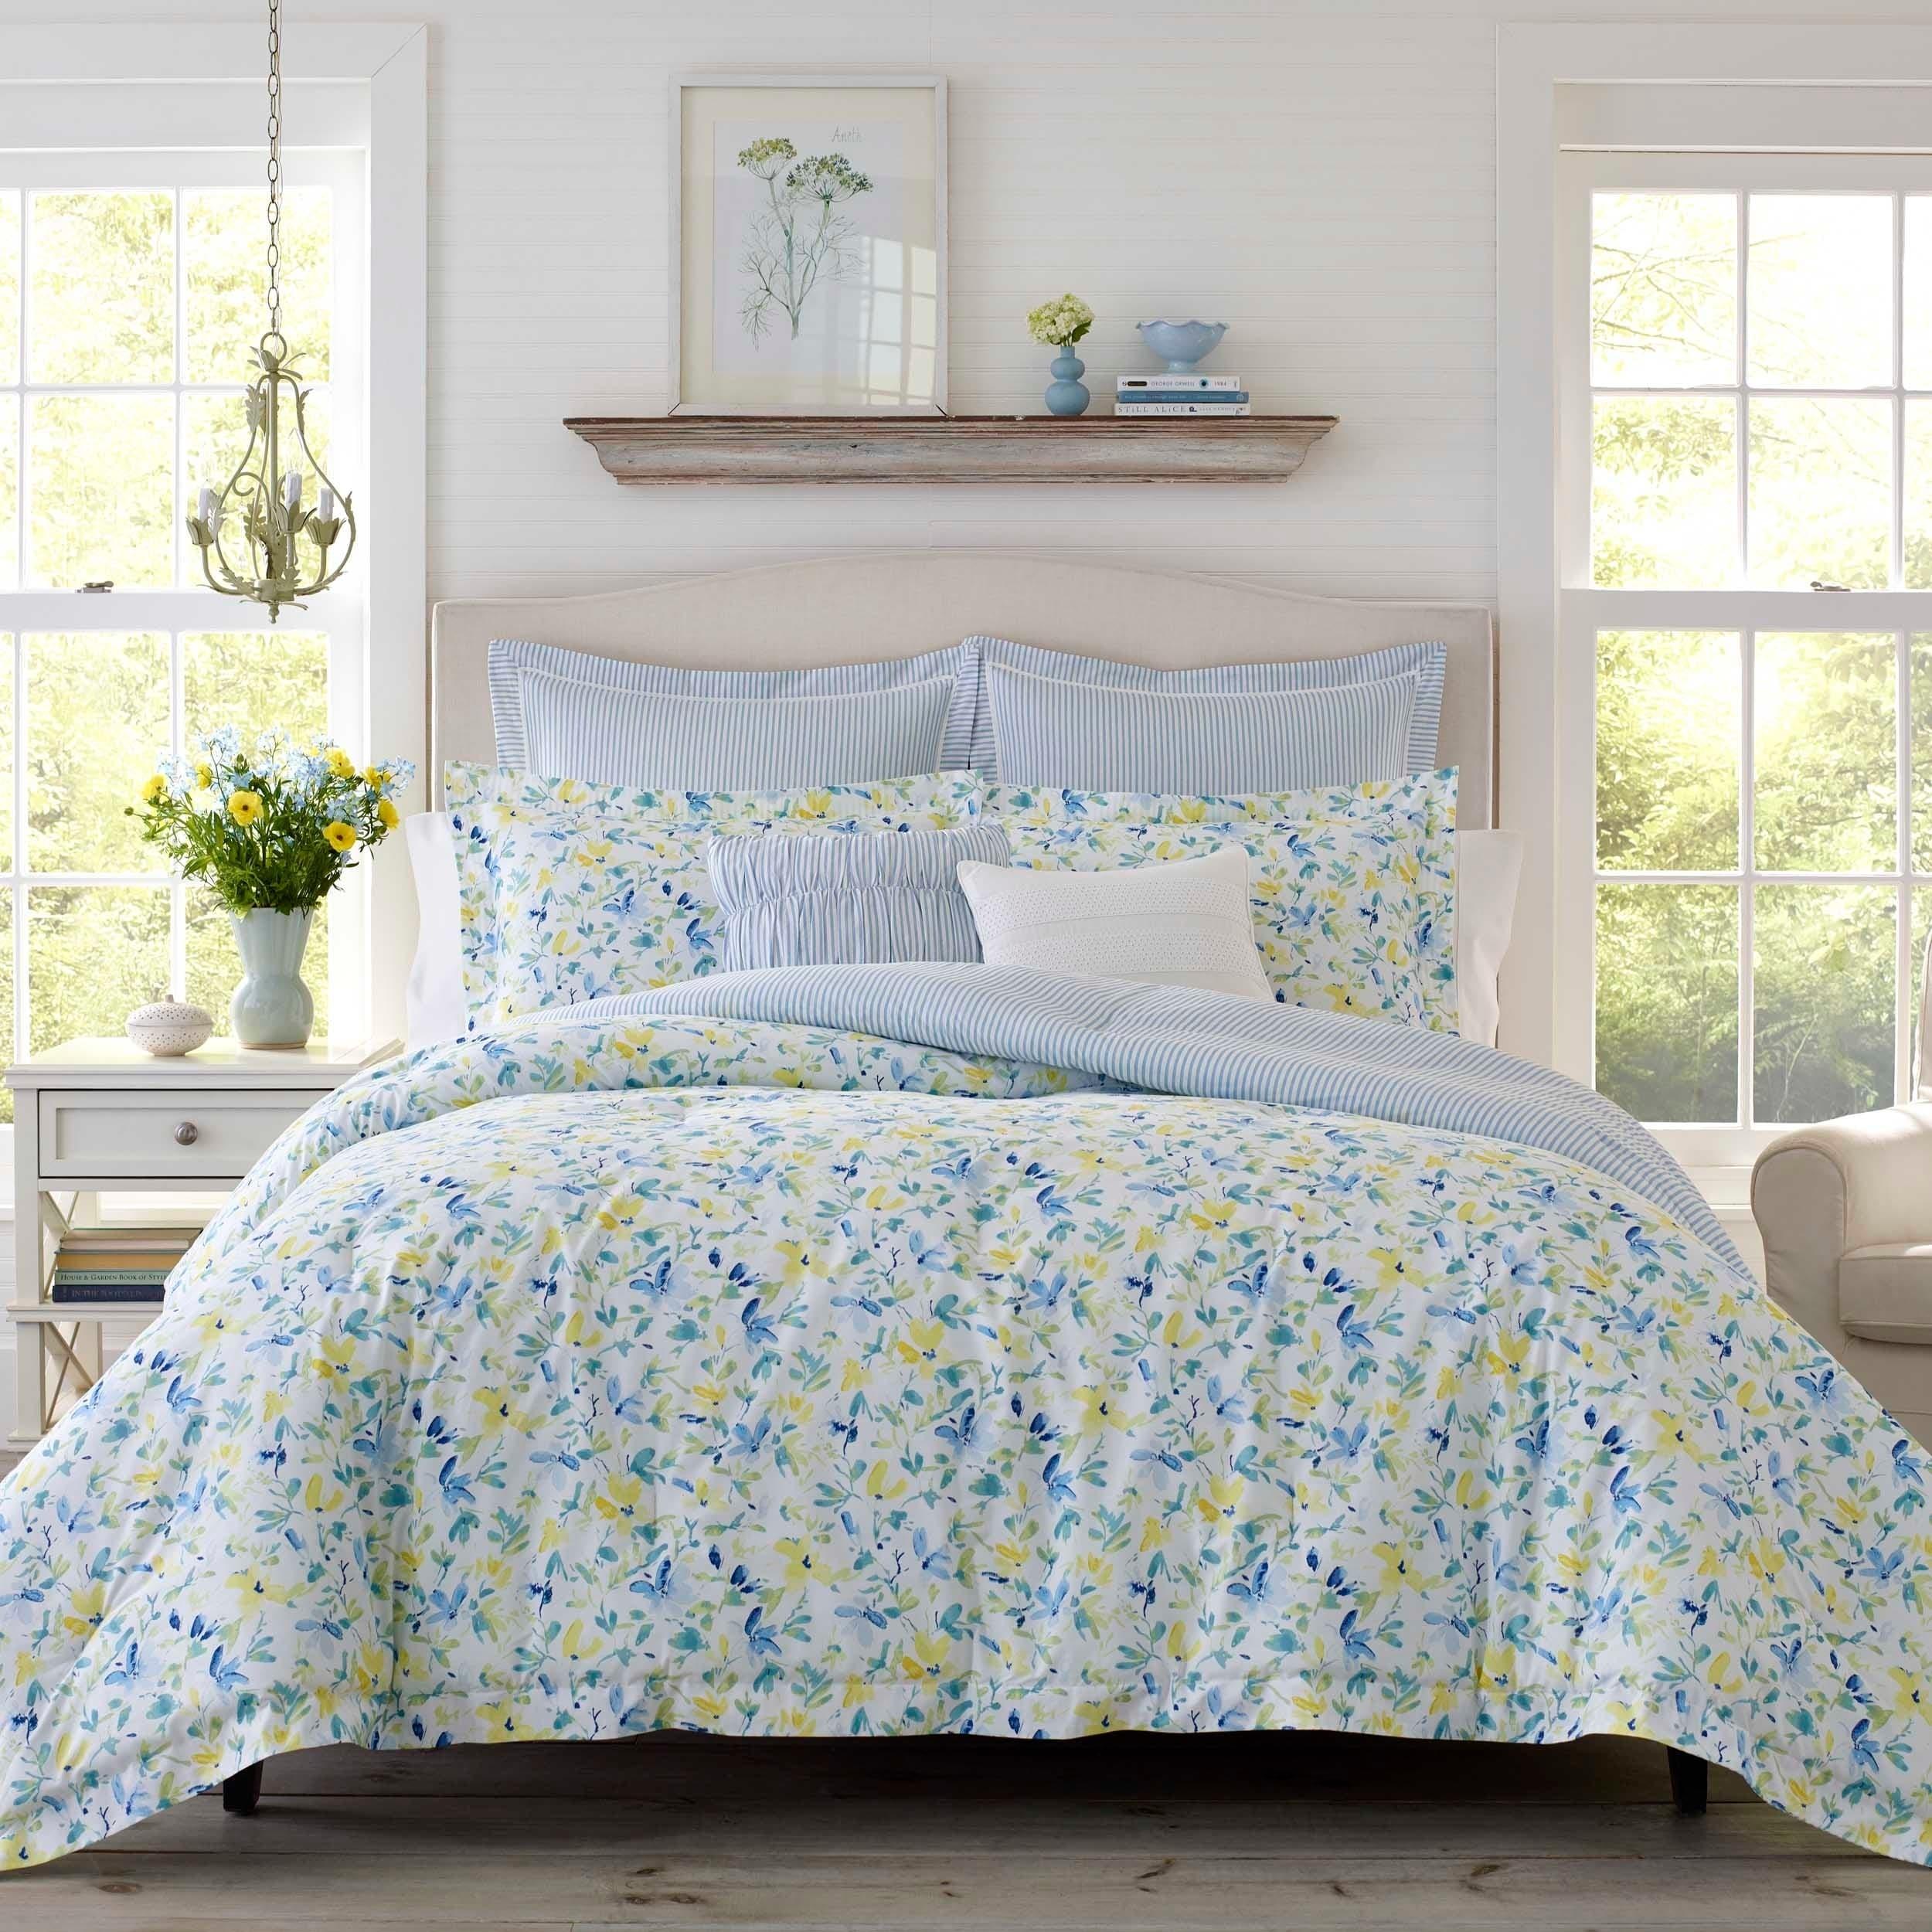 Shop Laura Ashley Nora 7 piece Comforter Set   On Sale   Overstock